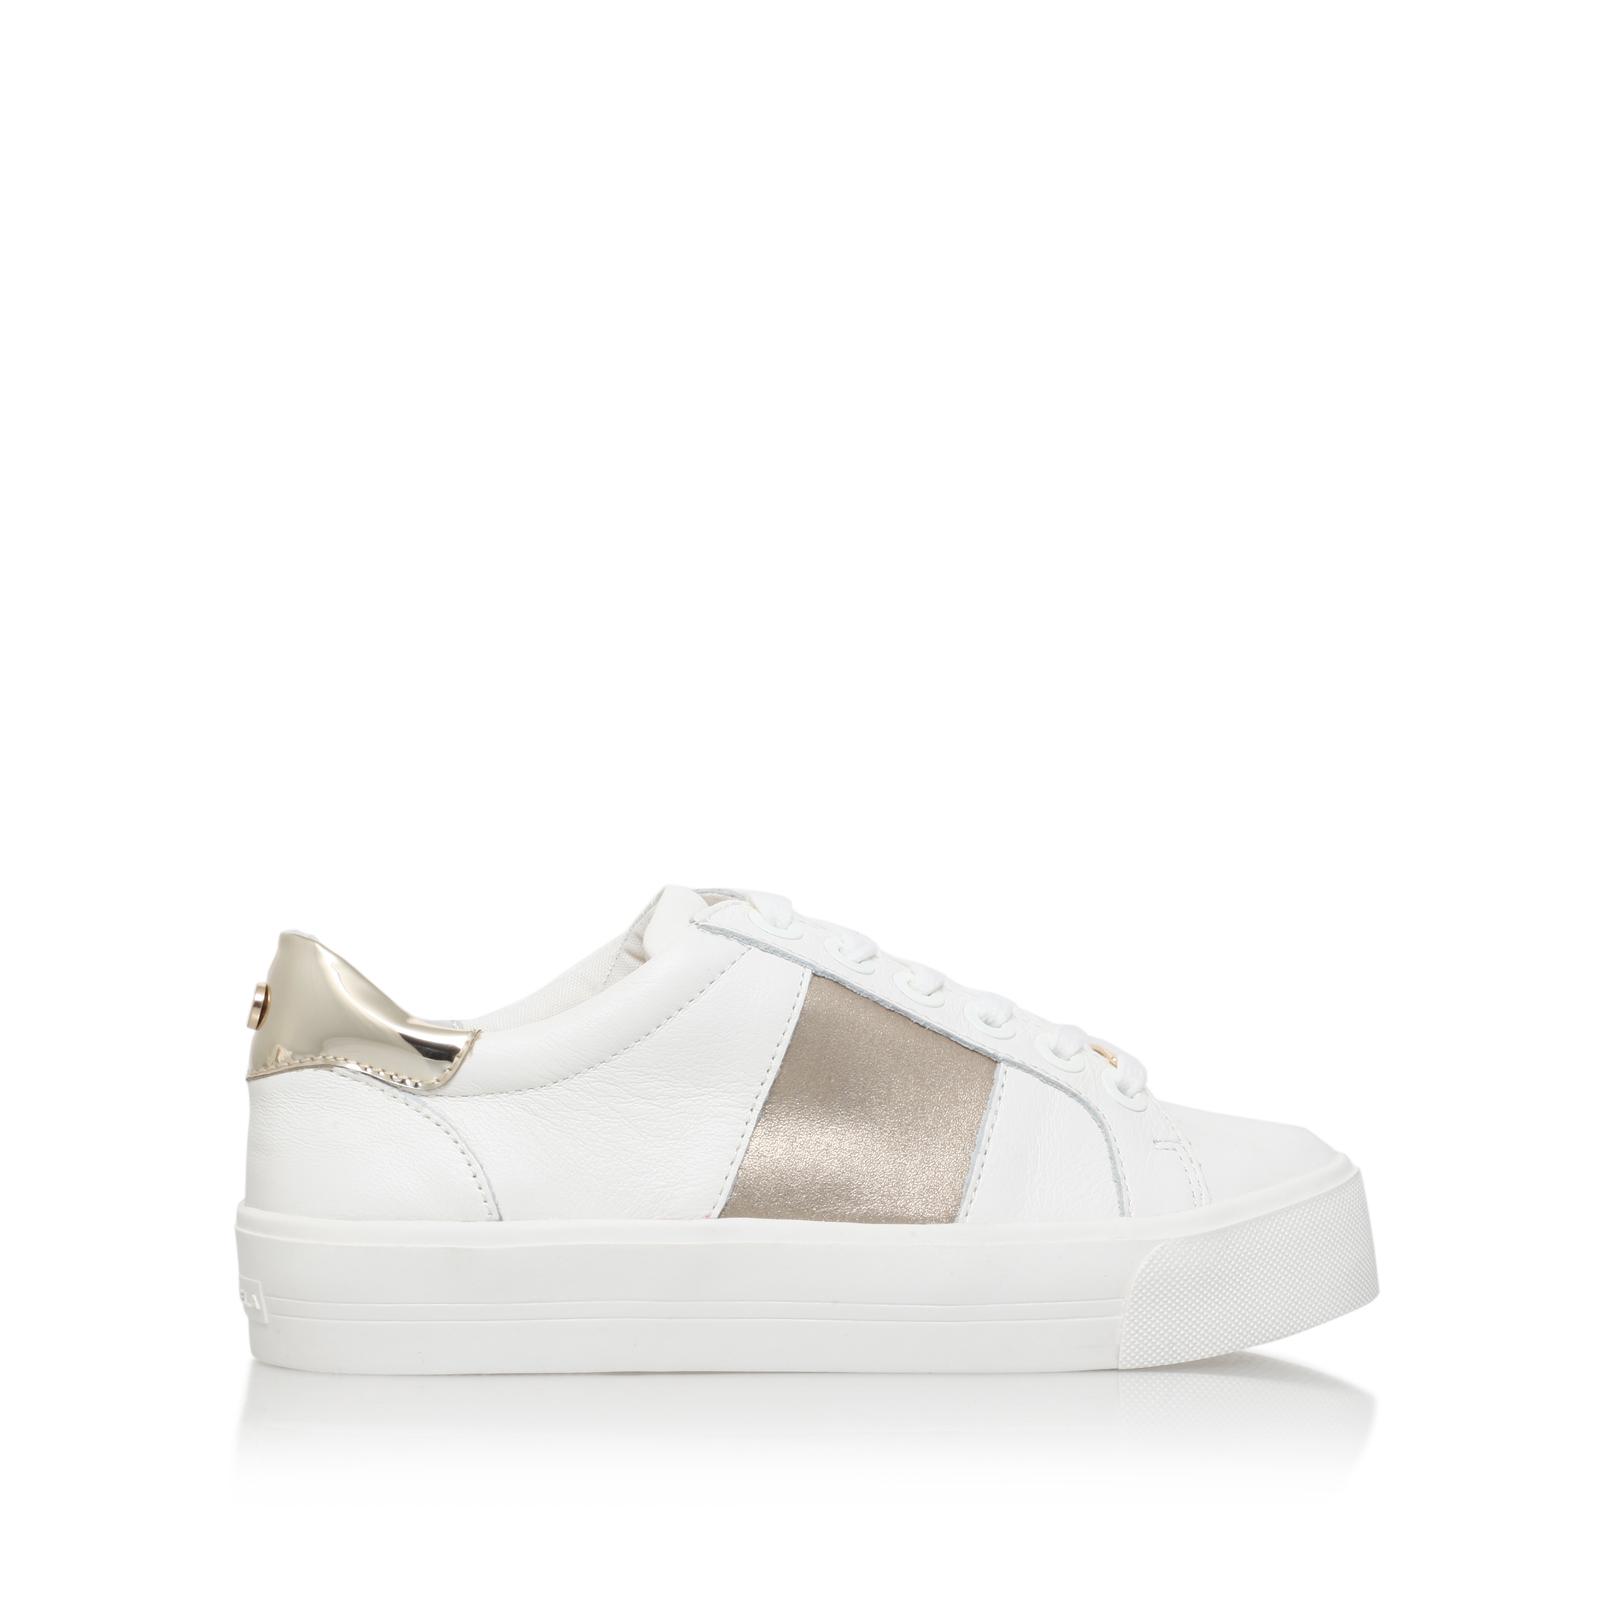 LOTUS - CARVELA Sneakers